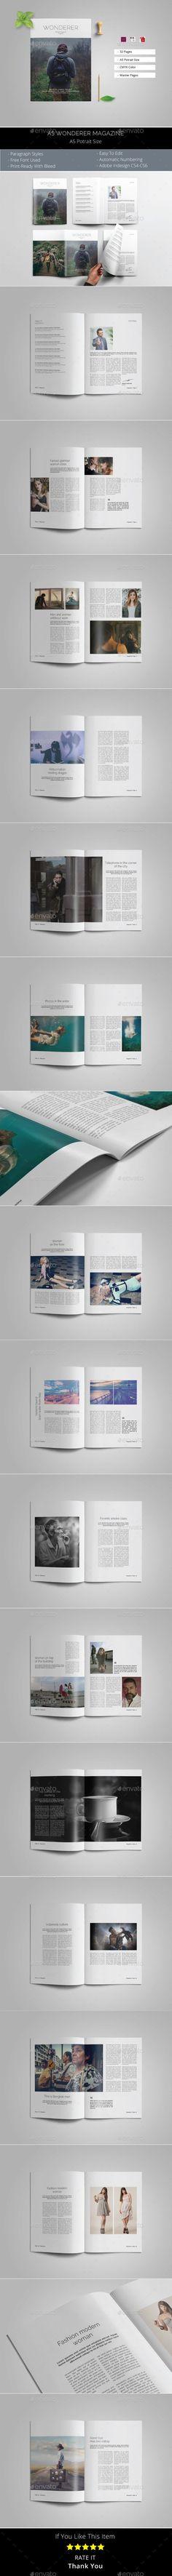 162 best Magazine   Grids & Templates images on Pinterest ...